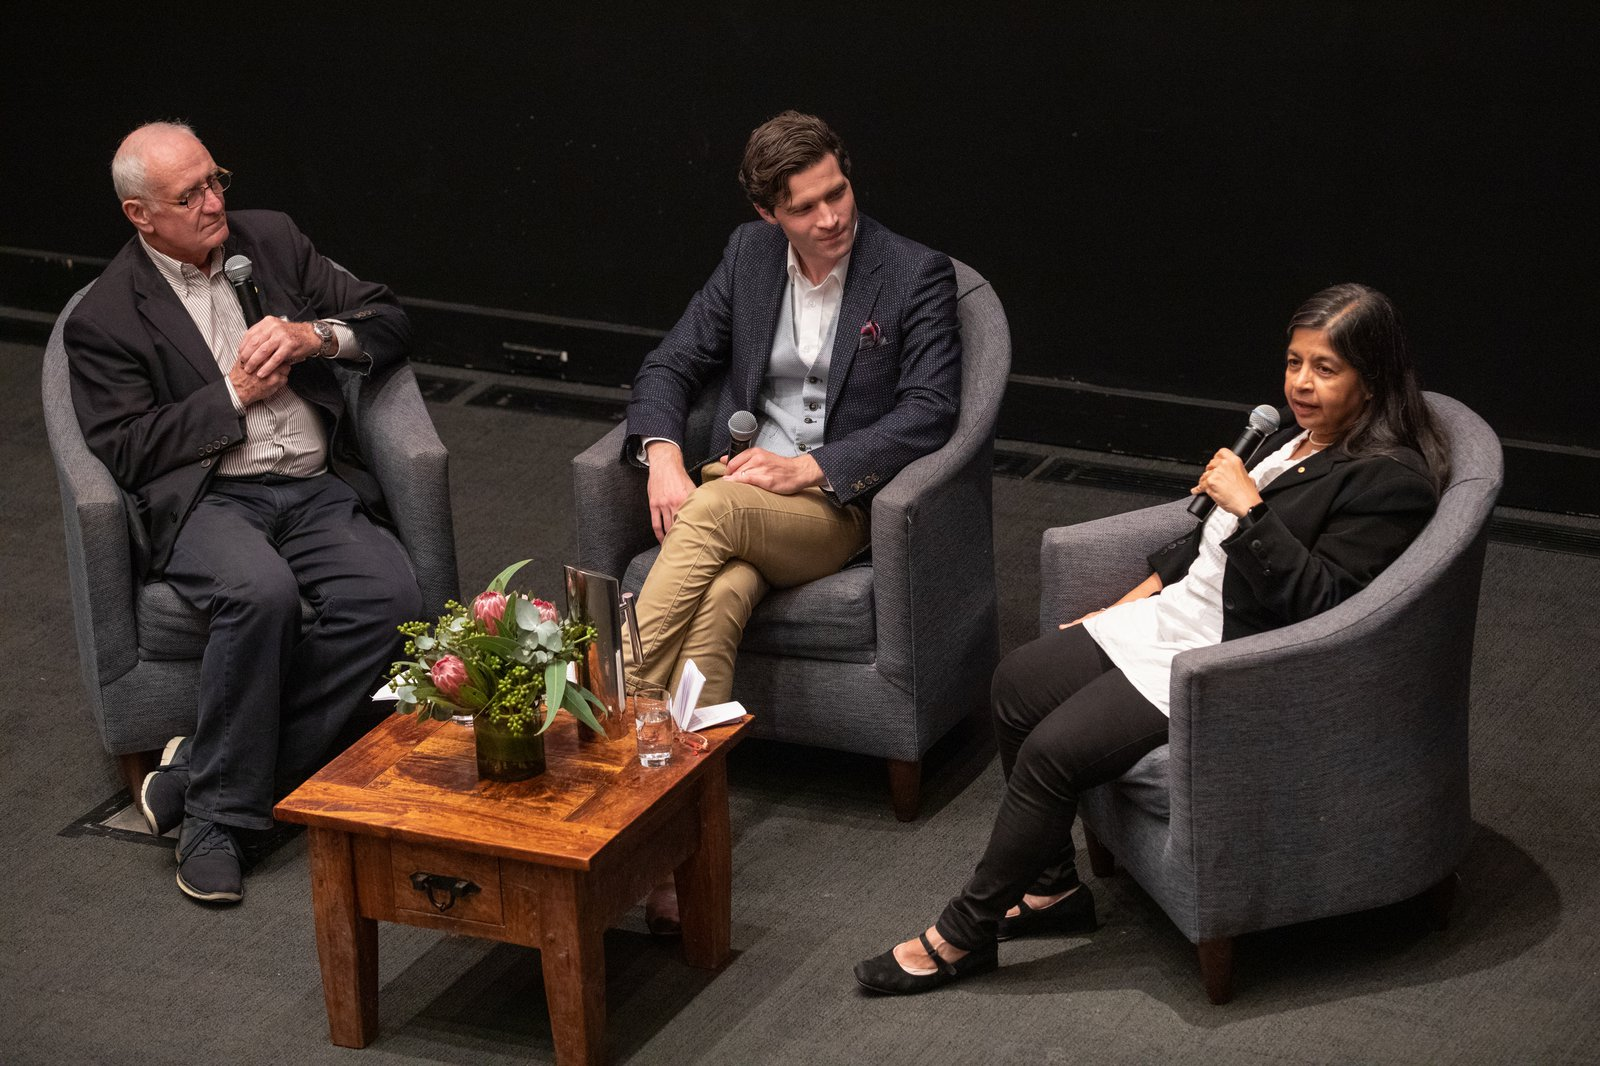 Eureka Prize winners Associate Professor Alan Duffy and Professor Nalini Joshi AO in conversation with Robyn Williams